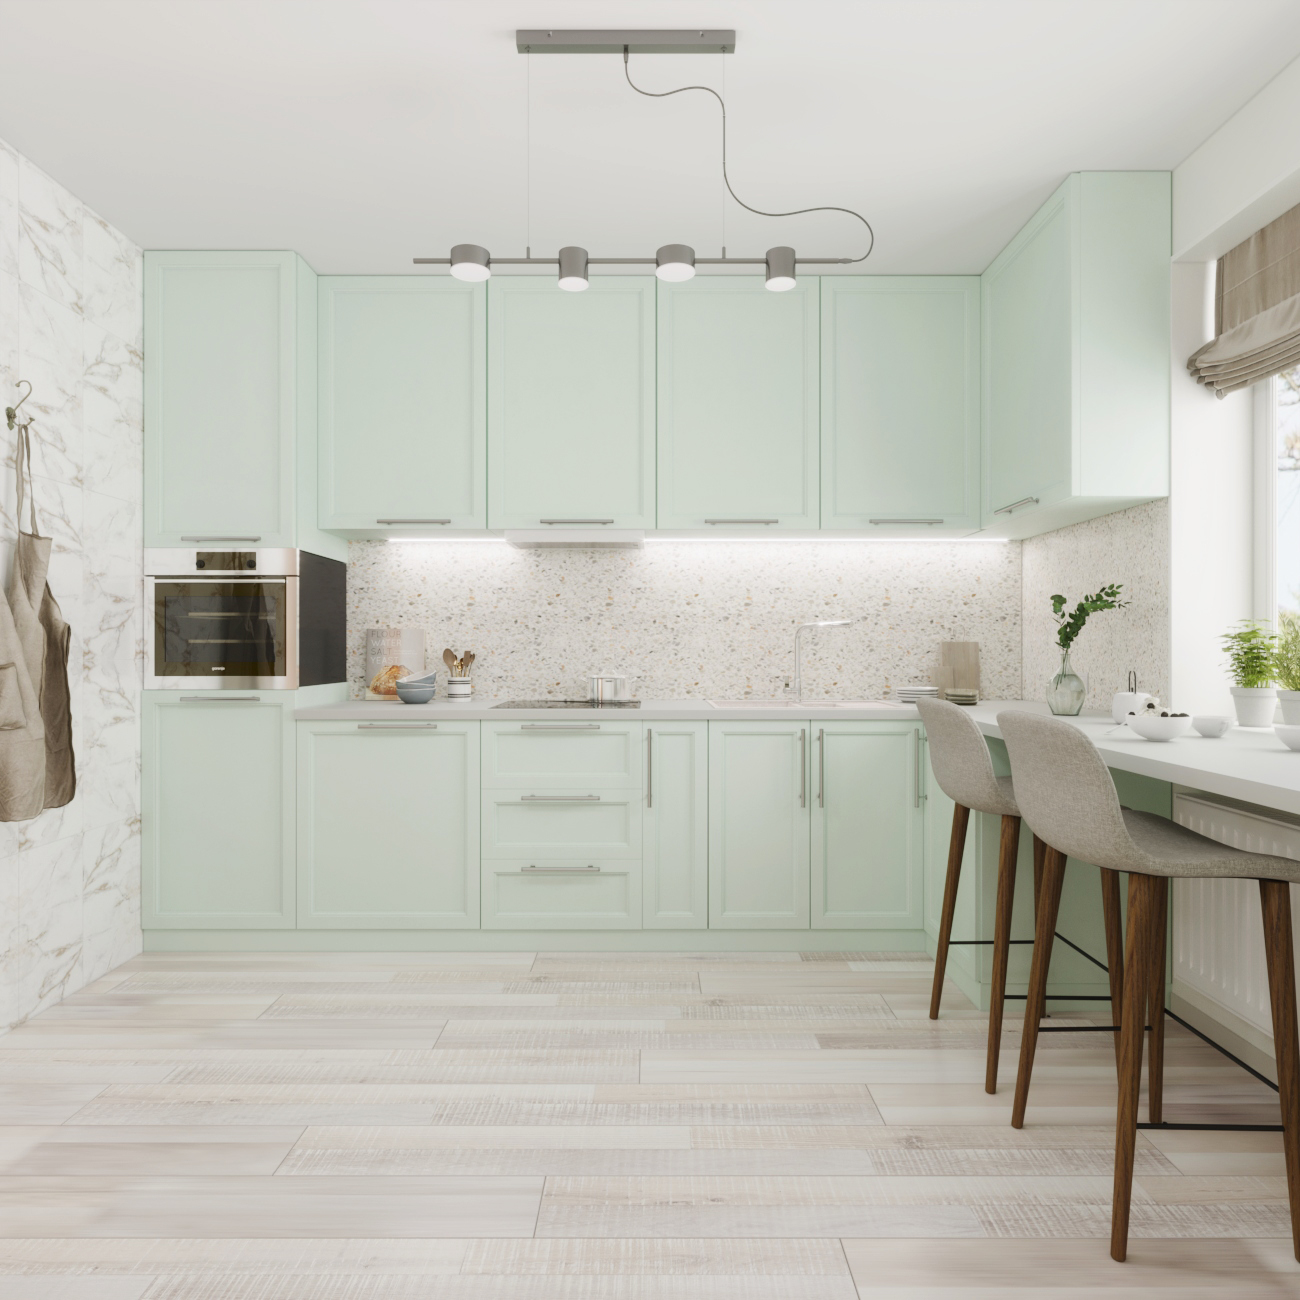 Фото Дизайн и визуализация интерьера кухни с использованием 3D max, Corona